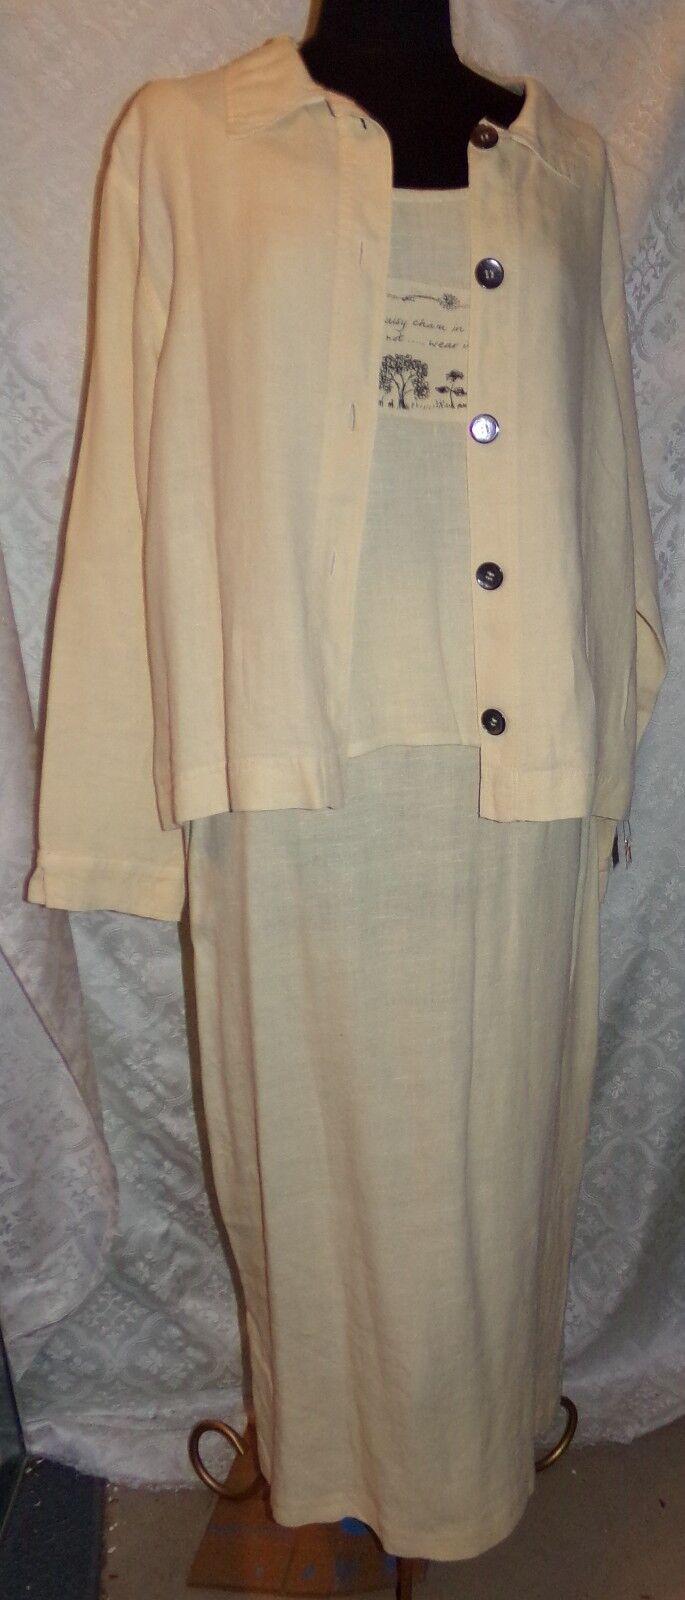 Garron M Pale Yellow Linen 3 Pc Womens Outfit Suit Skirt Sleeveless Top